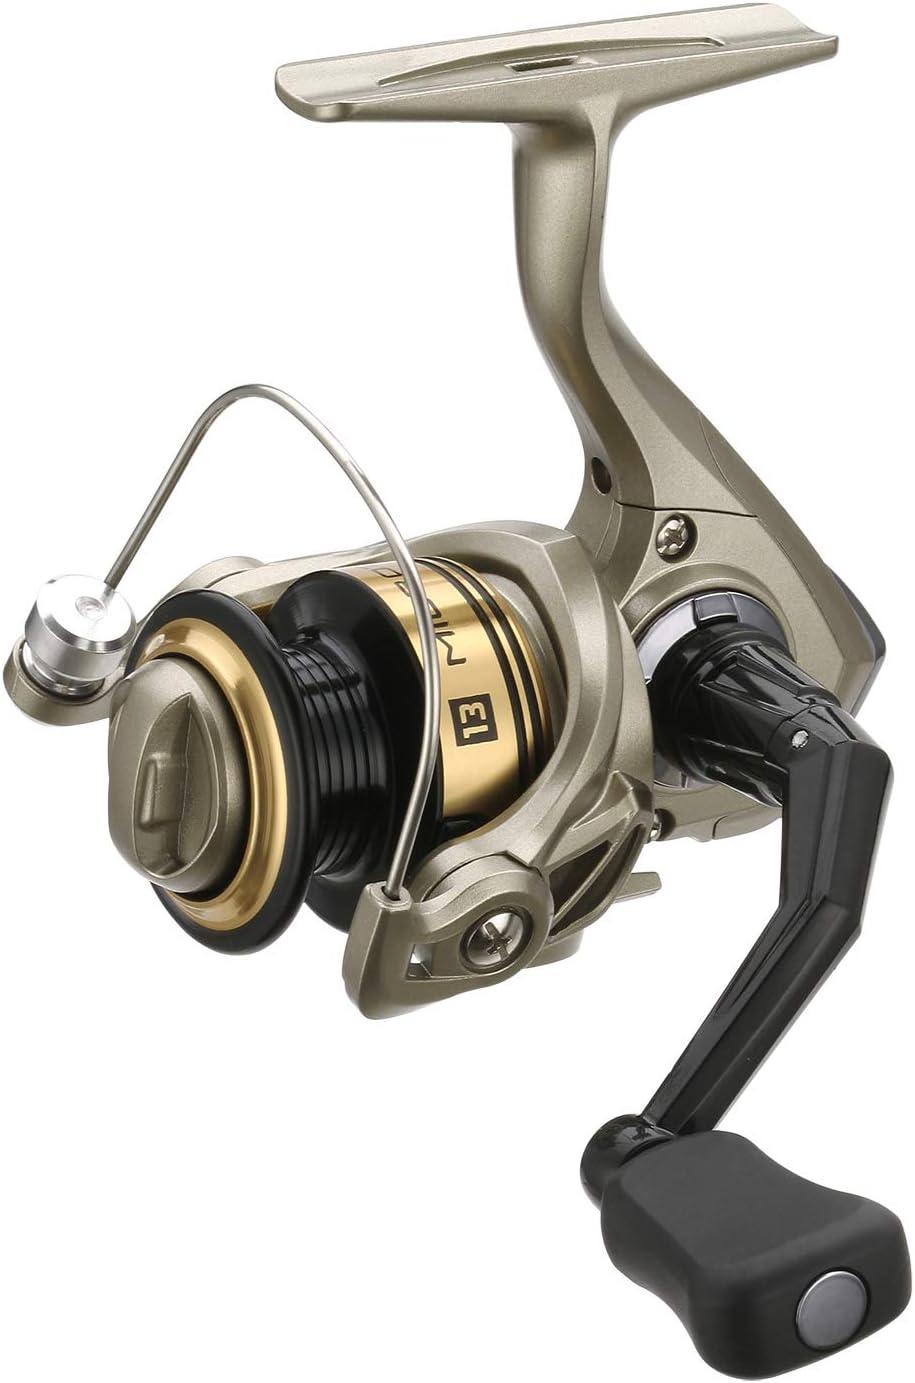 MPC3-25L 25 L - Titanium Spring Bobber Tickle Tip 13 FISHING Light Microtec Panfish Ice Combo